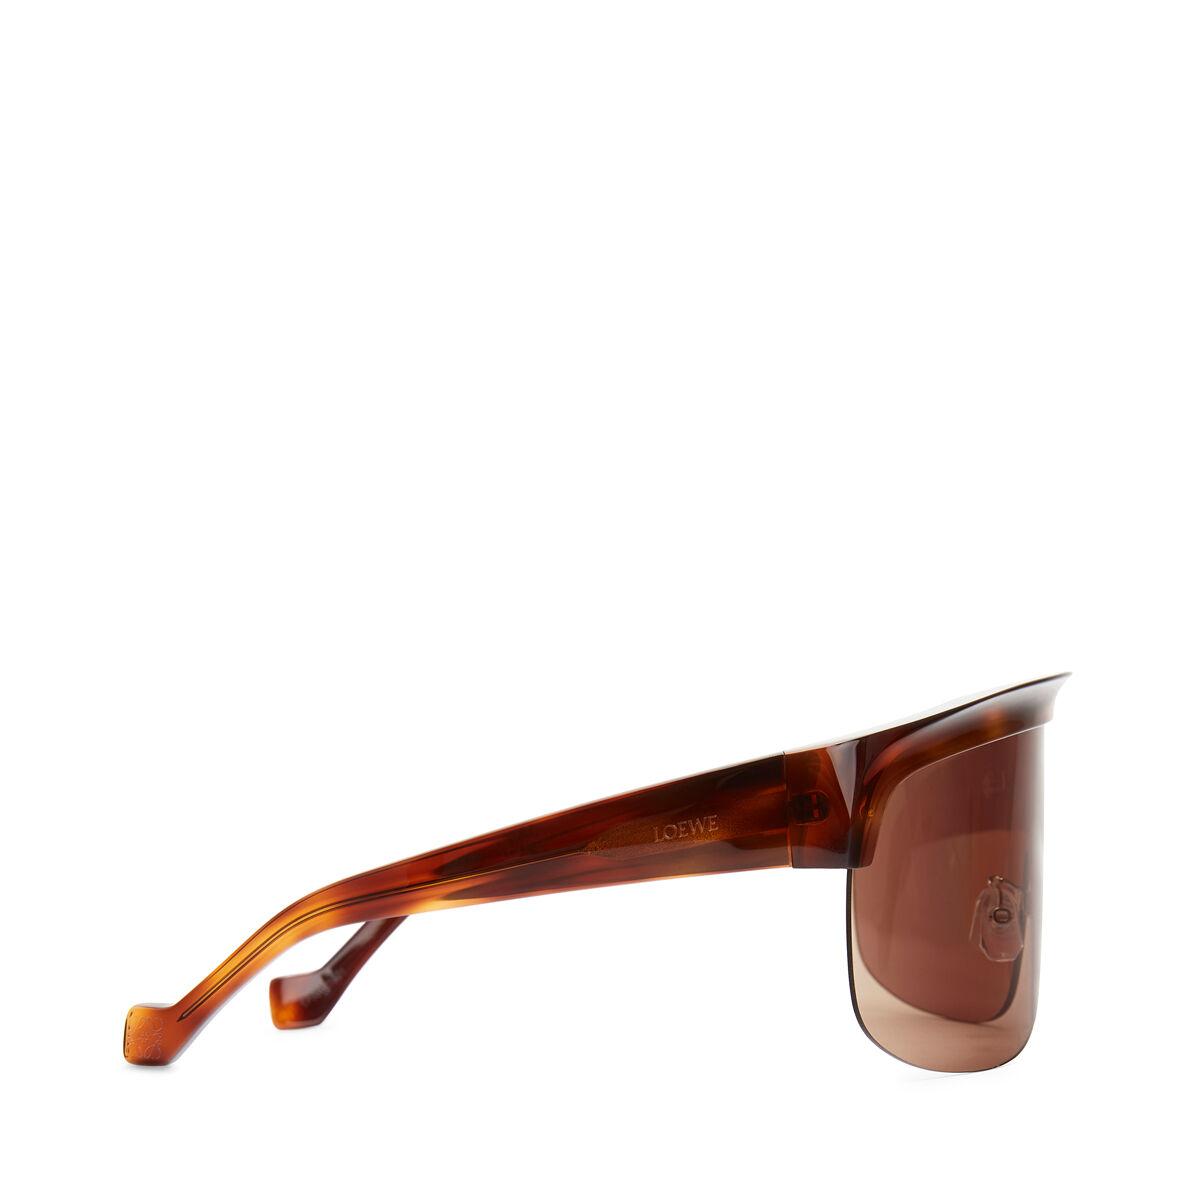 LOEWE Gafas Show Habana Claro front